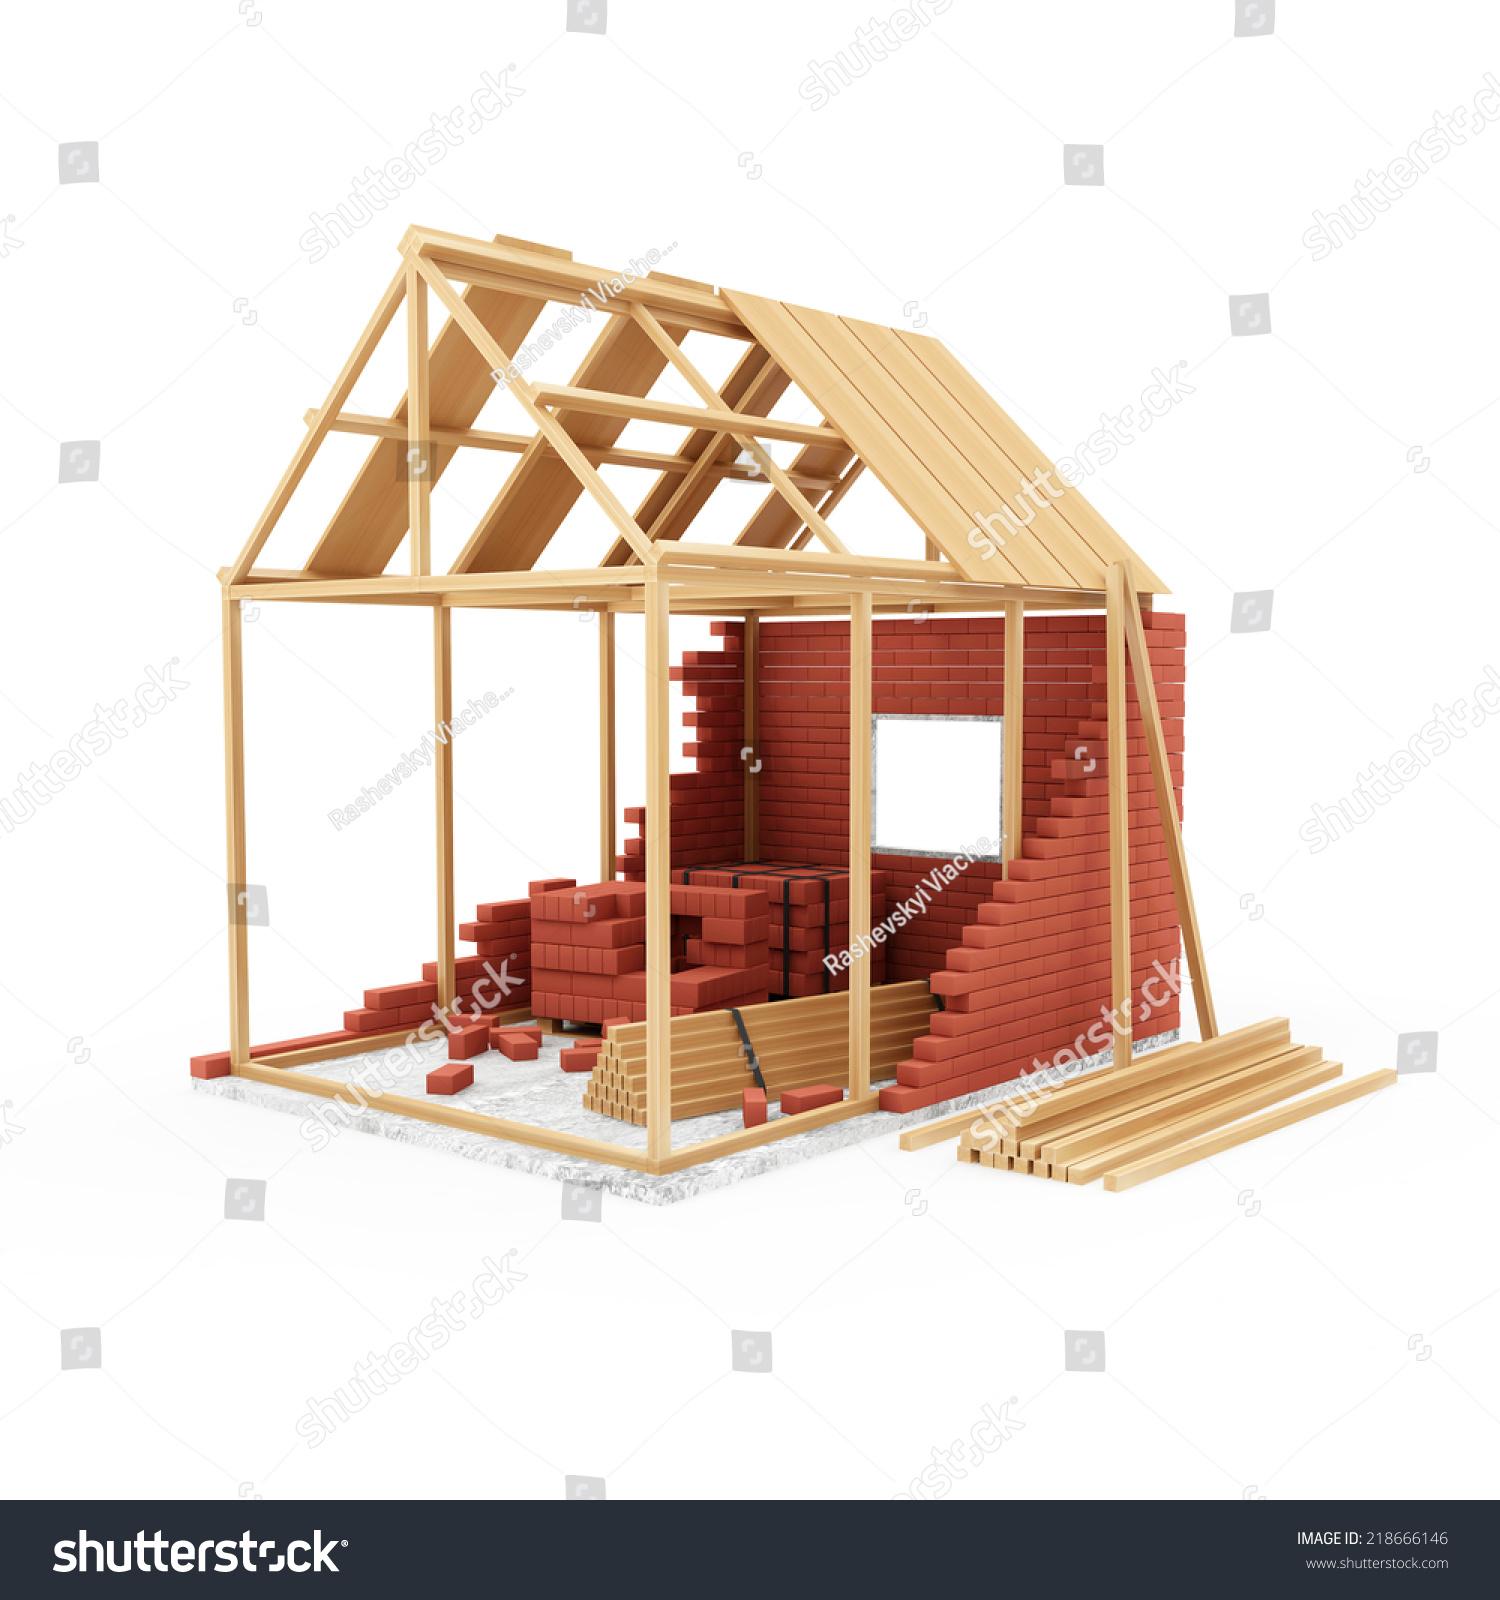 Home Construction Concept House Under Construction Stock ...